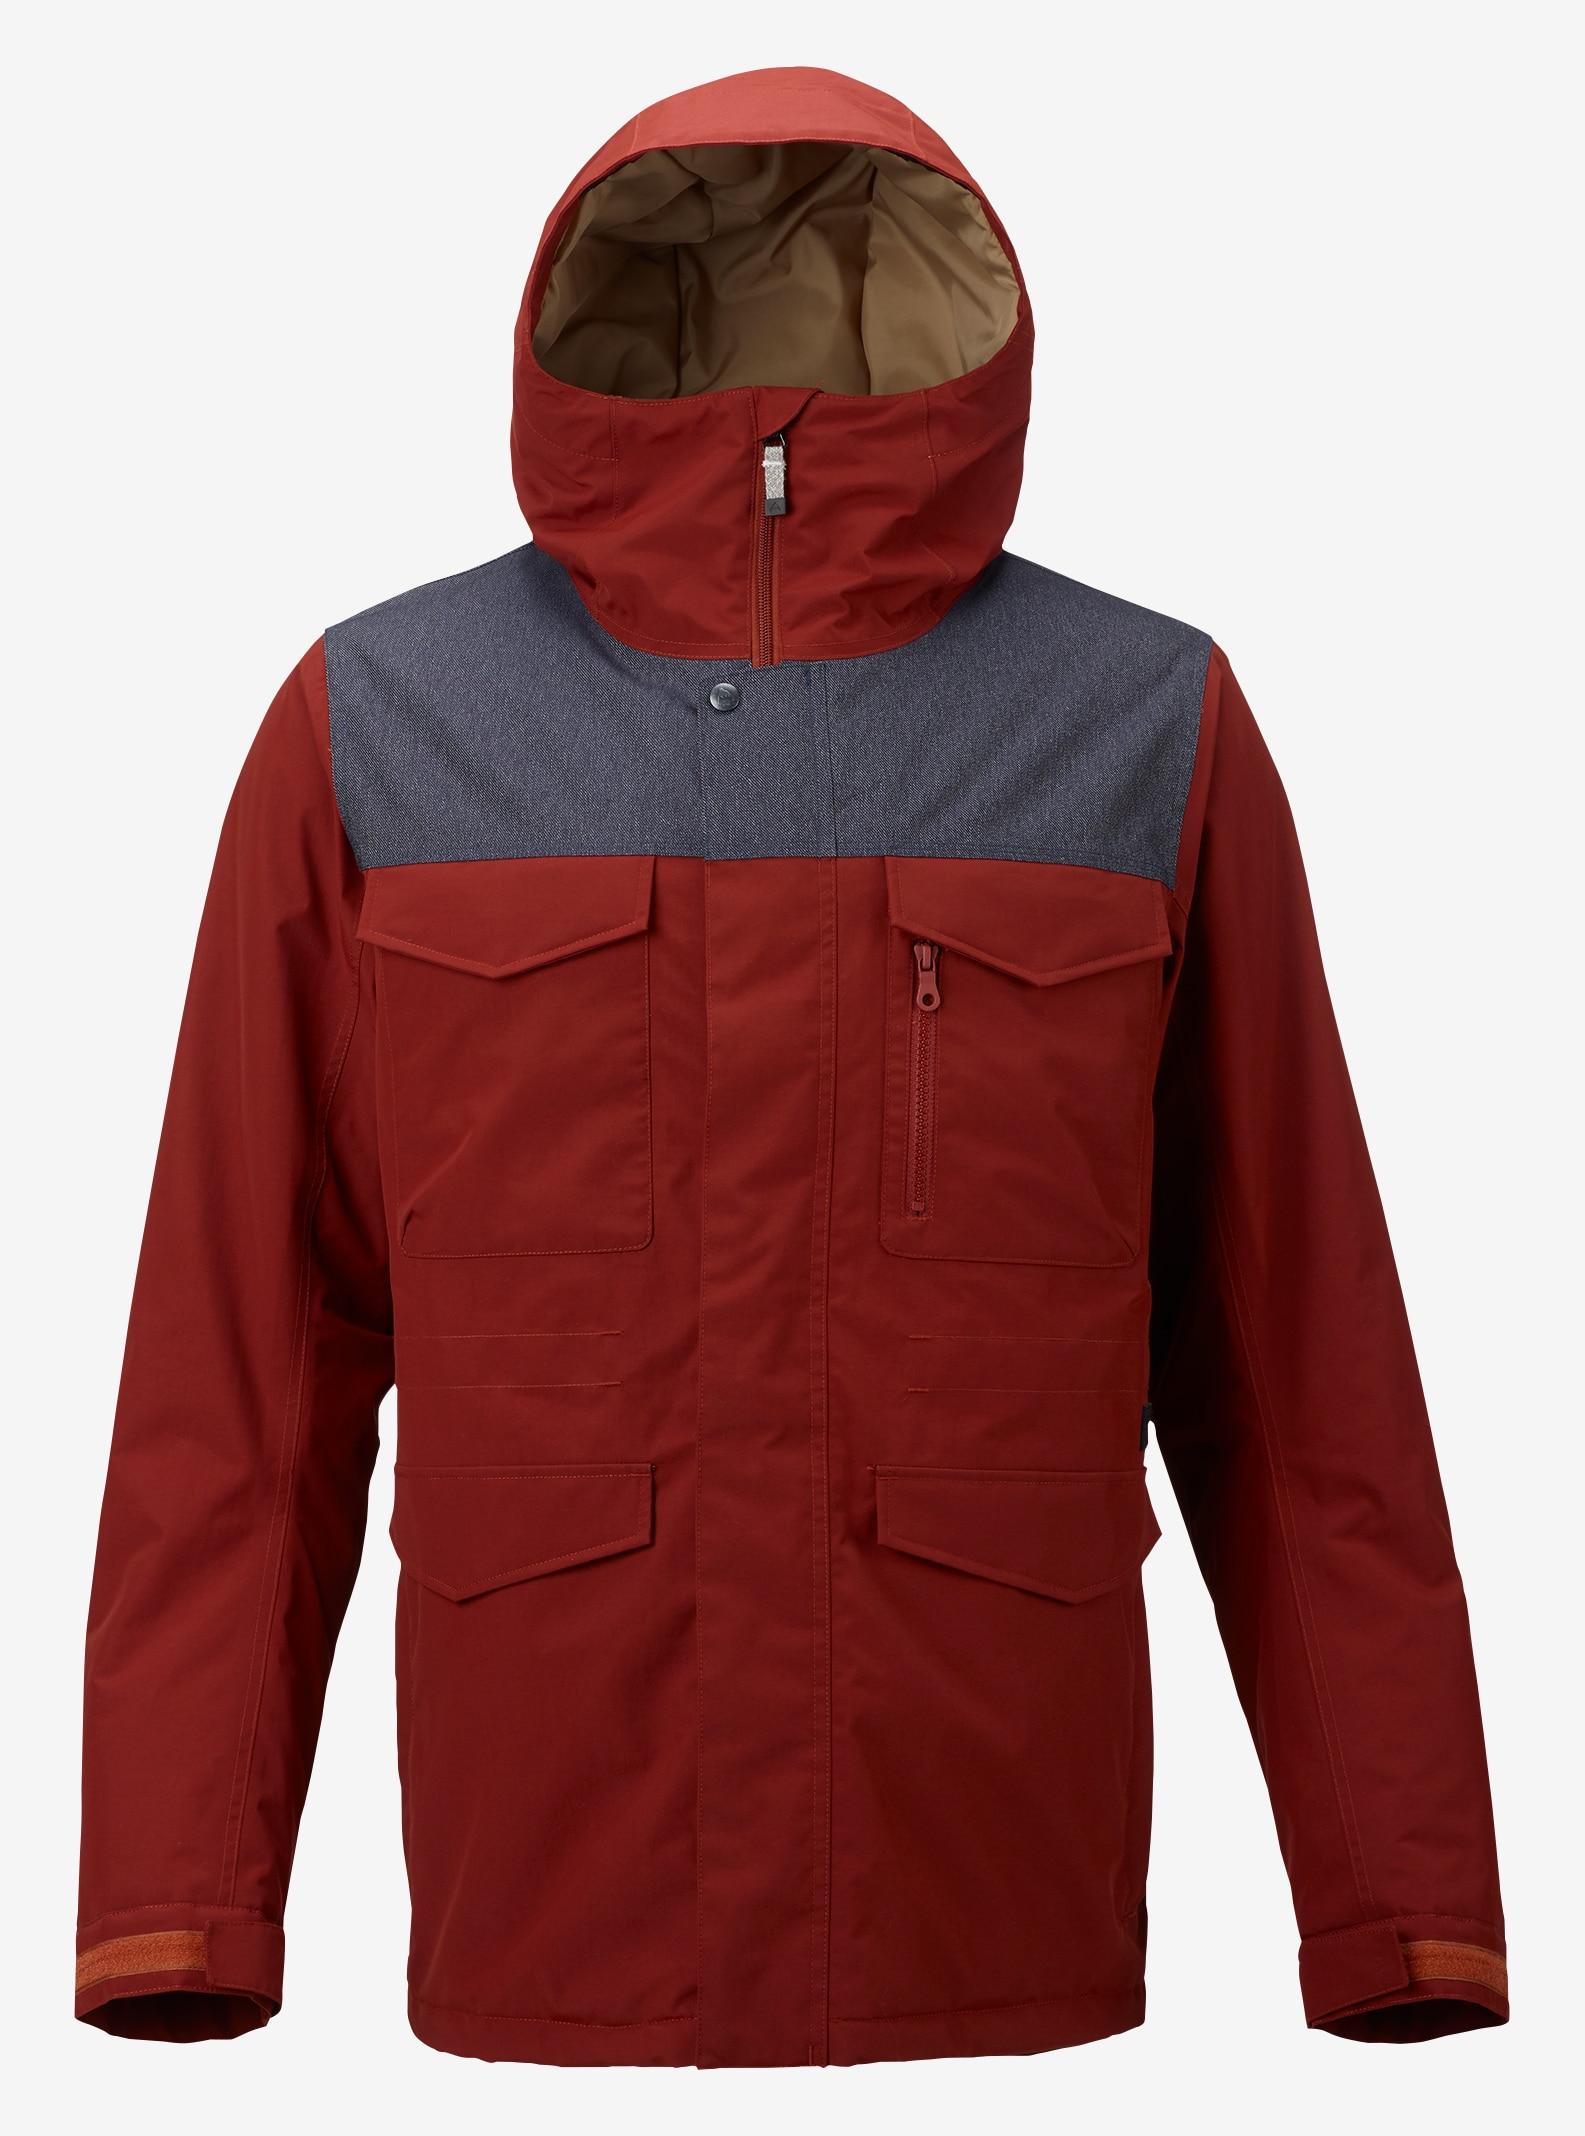 Men's Burton Covert Insulated Jacket shown in Fired Brick / Denim